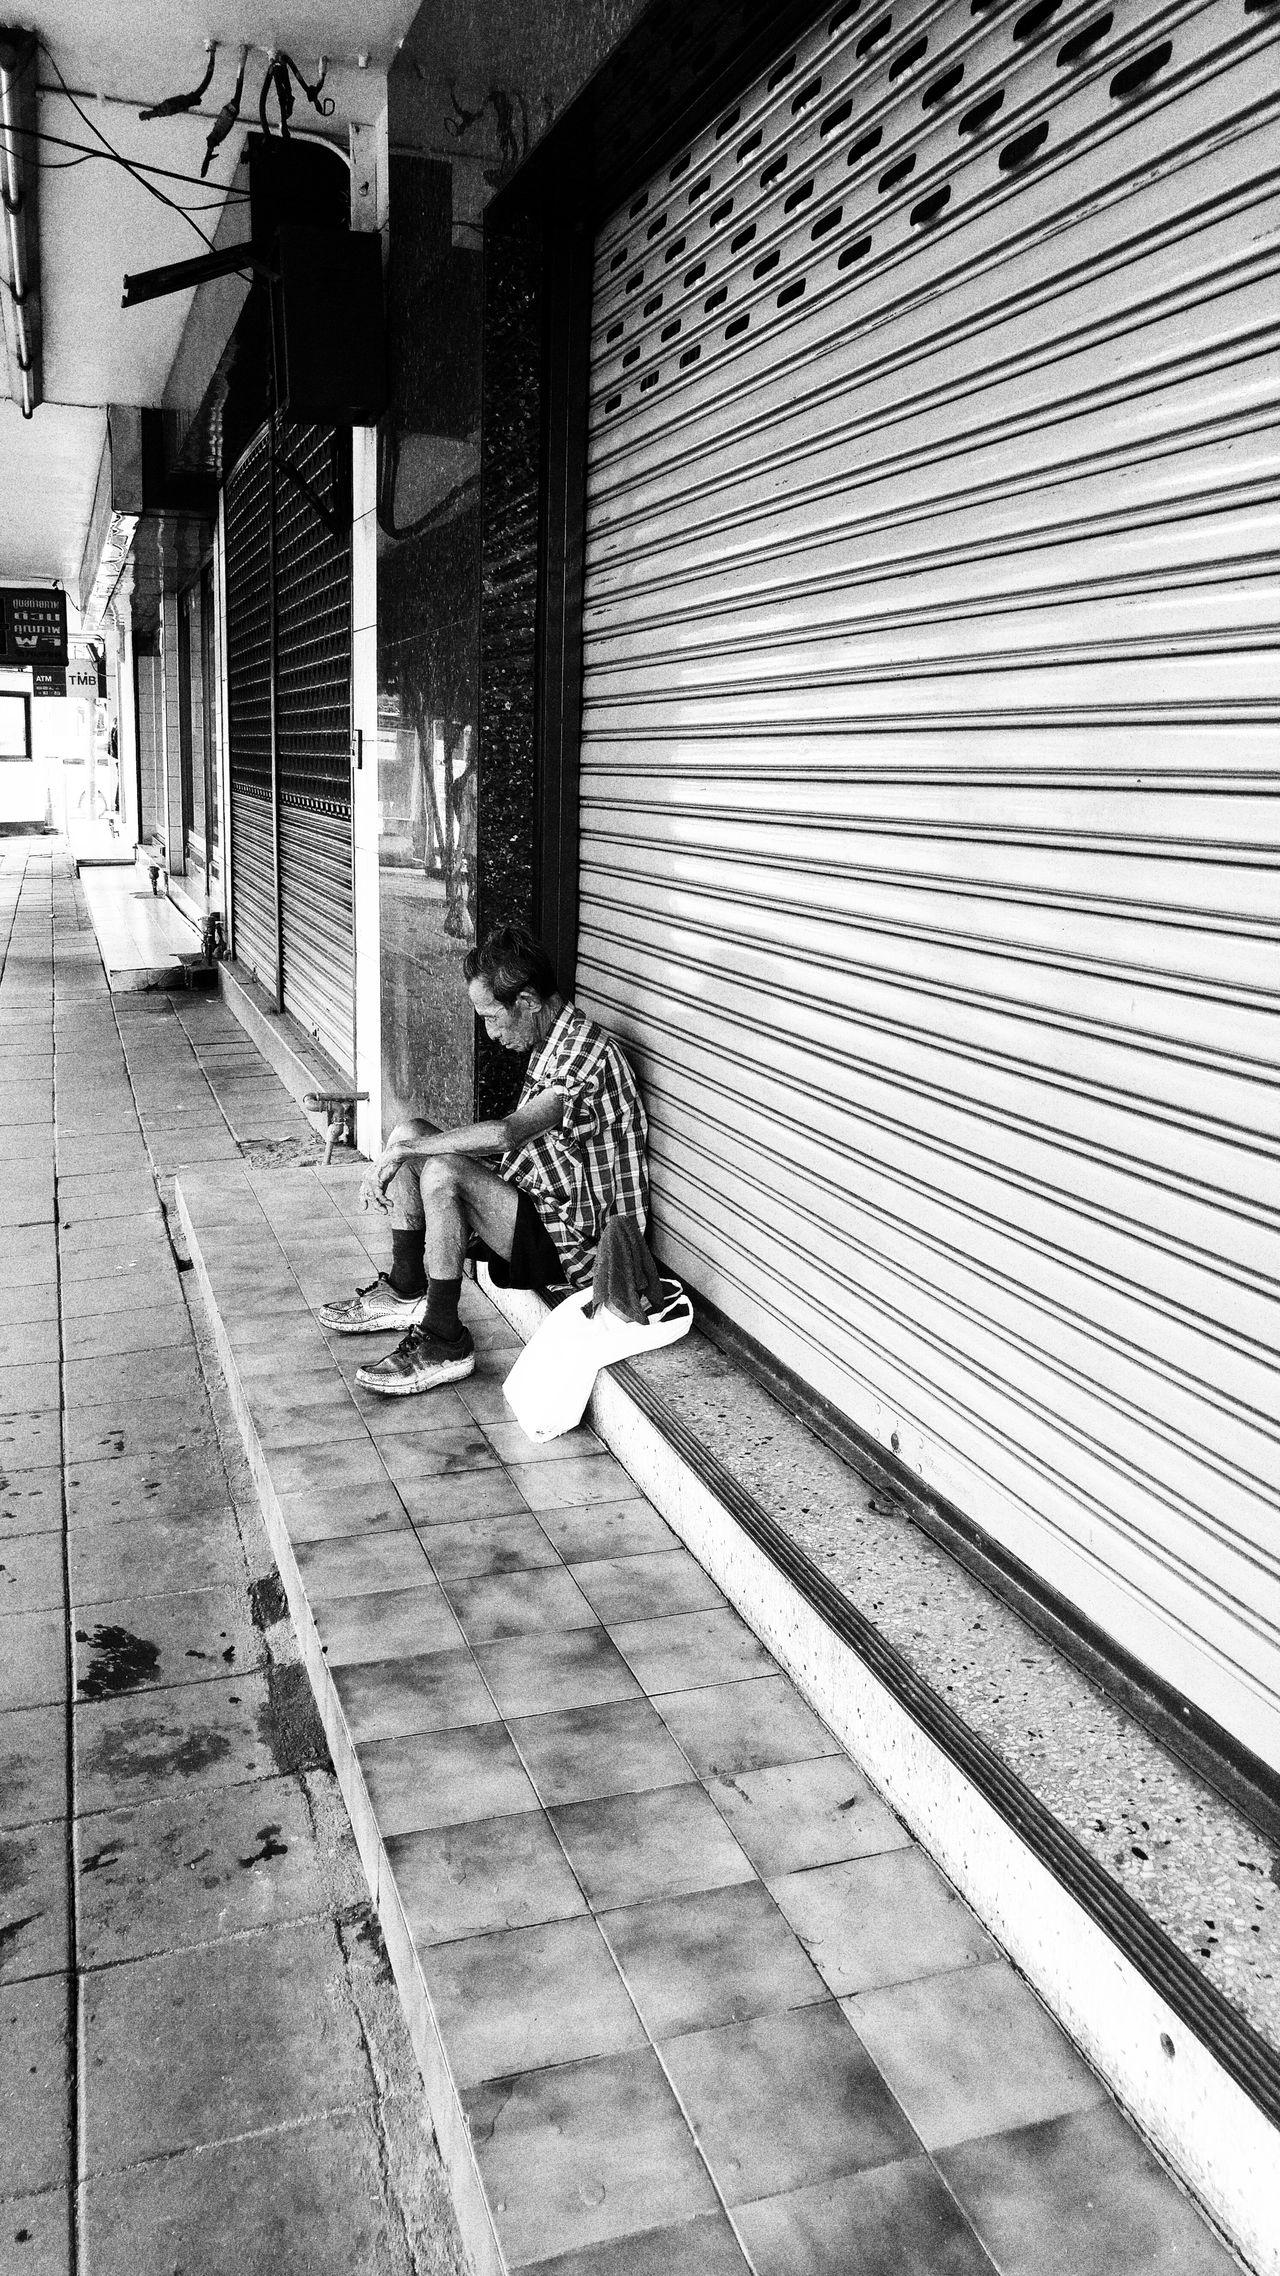 Streetphotography Life Lifestyle Nappin Drunken Blackandwhite Black And White Blackandwhite Photography Blackandwhitephotography Lgg4photography LGG4 Snapseed